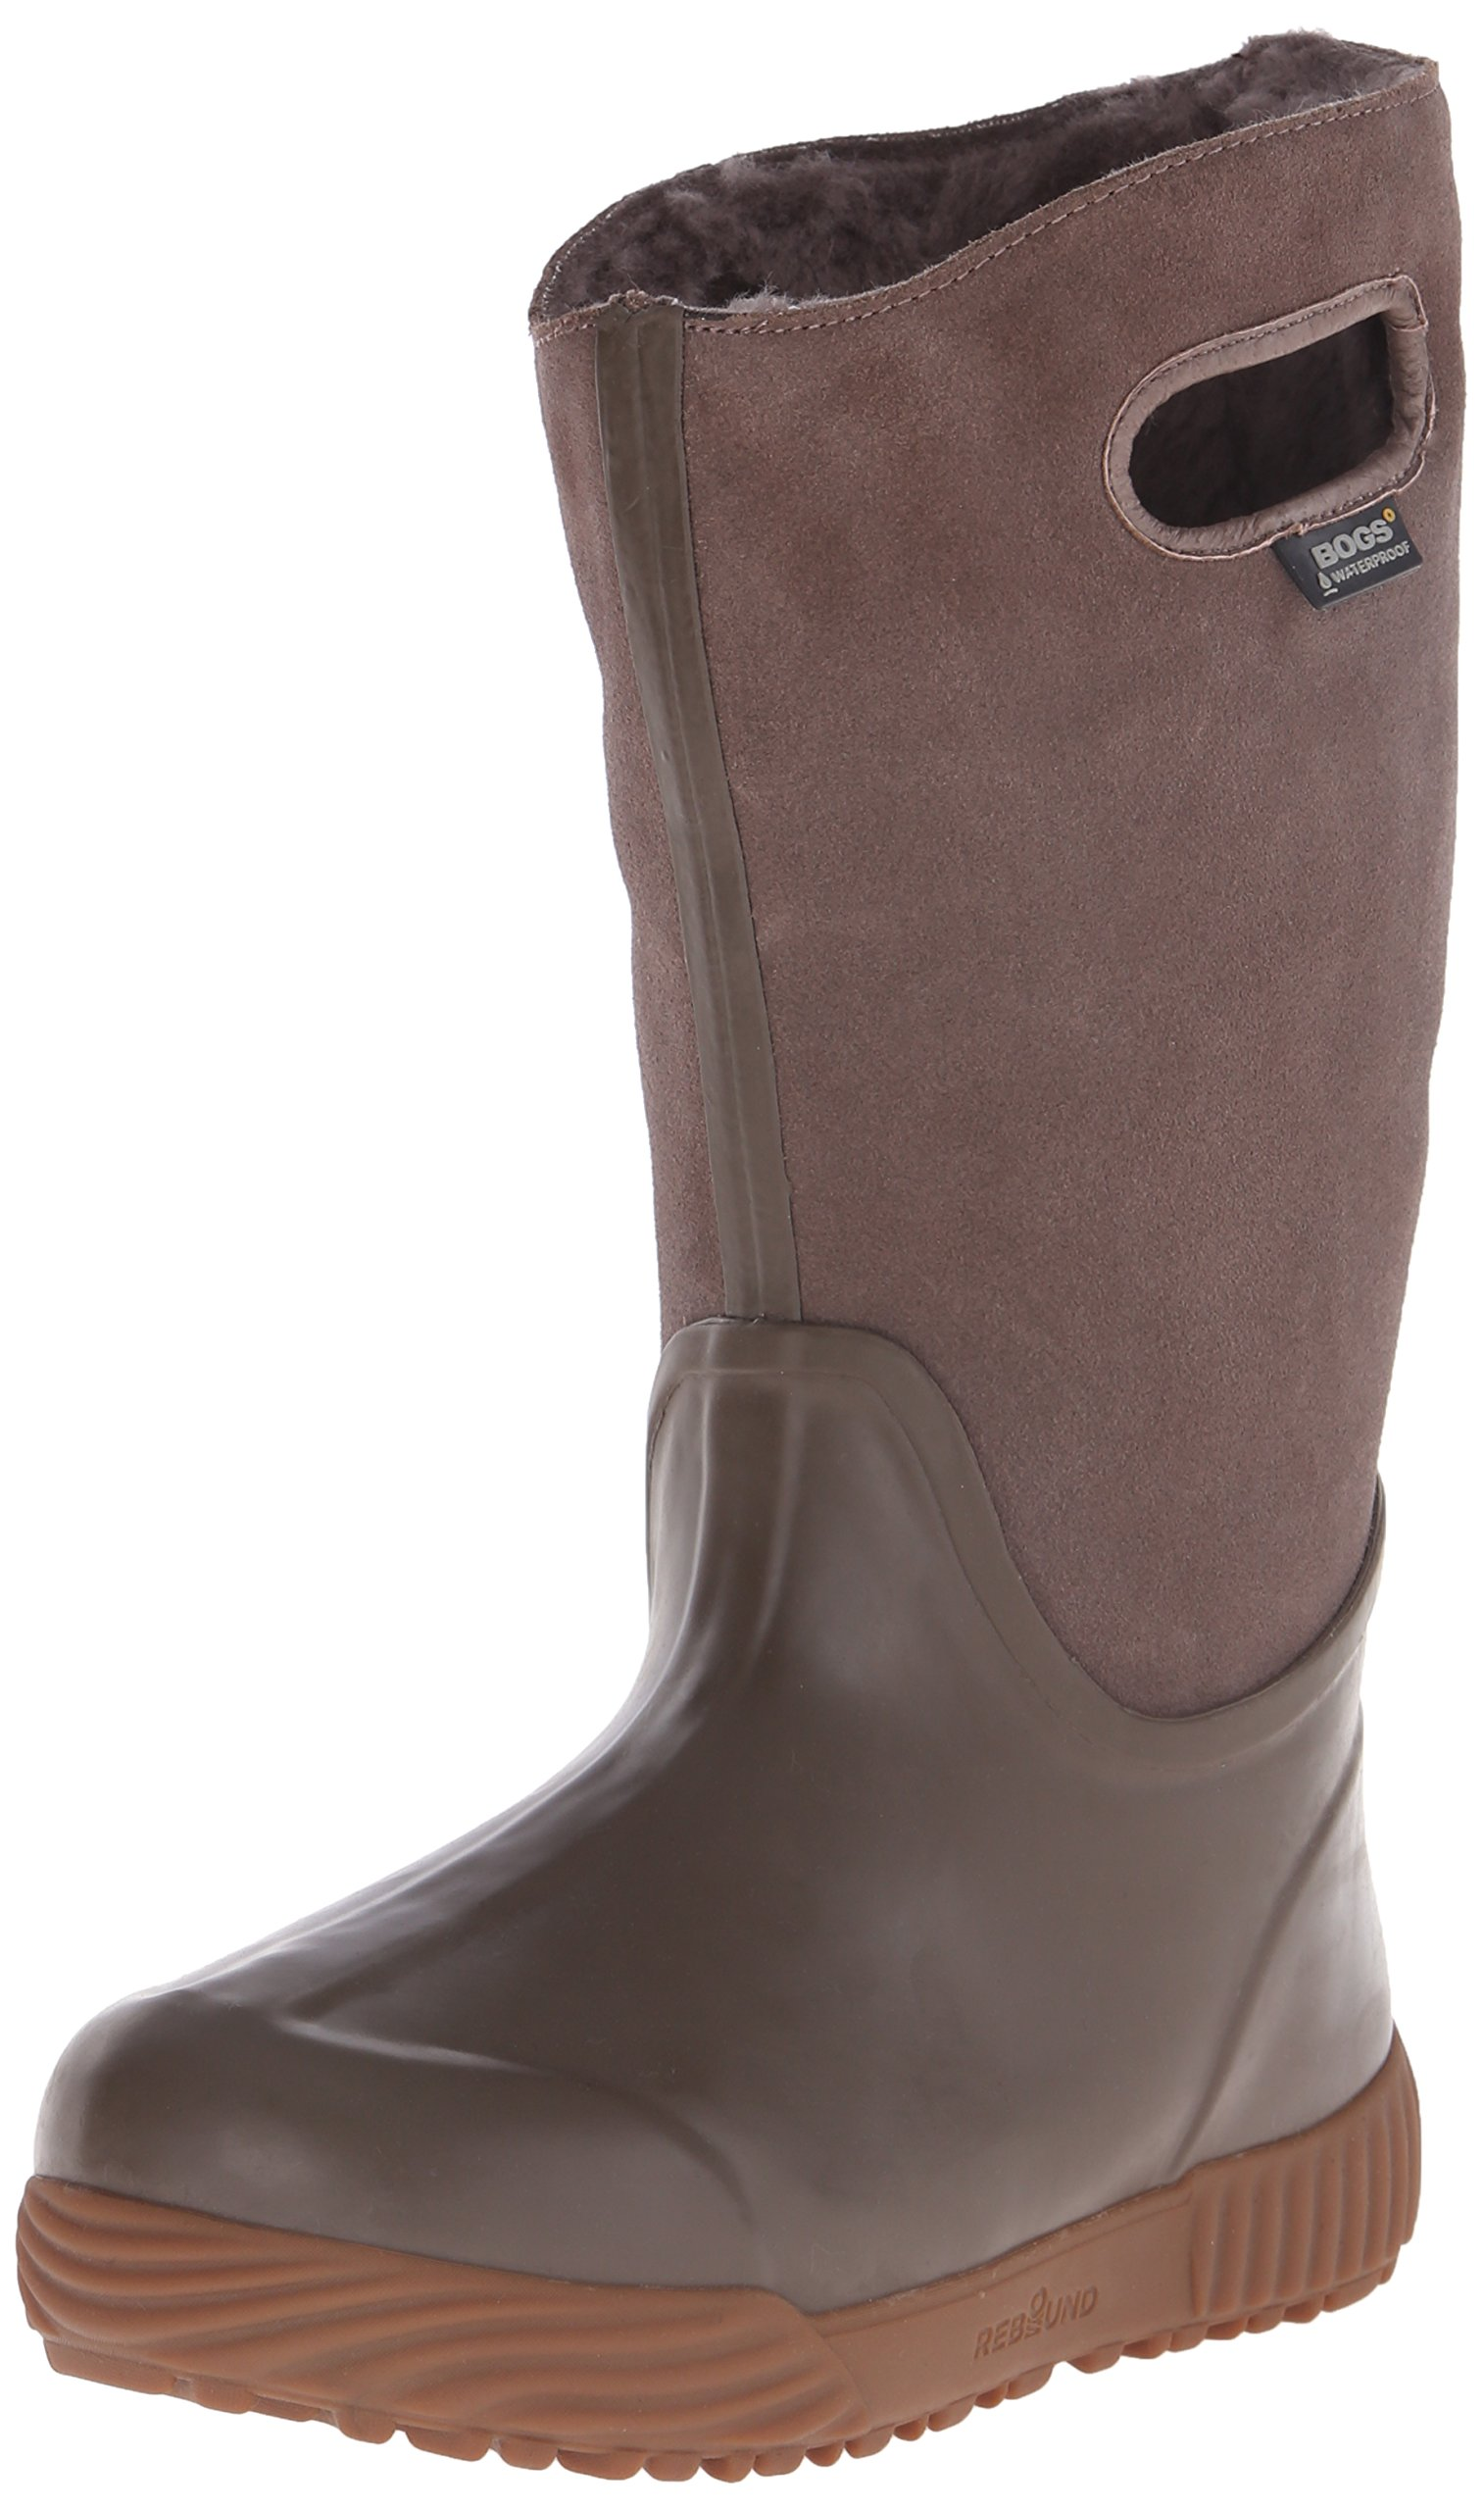 Bogs Women's Prairie Tall Waterproof Insulated Boot, Mushroom